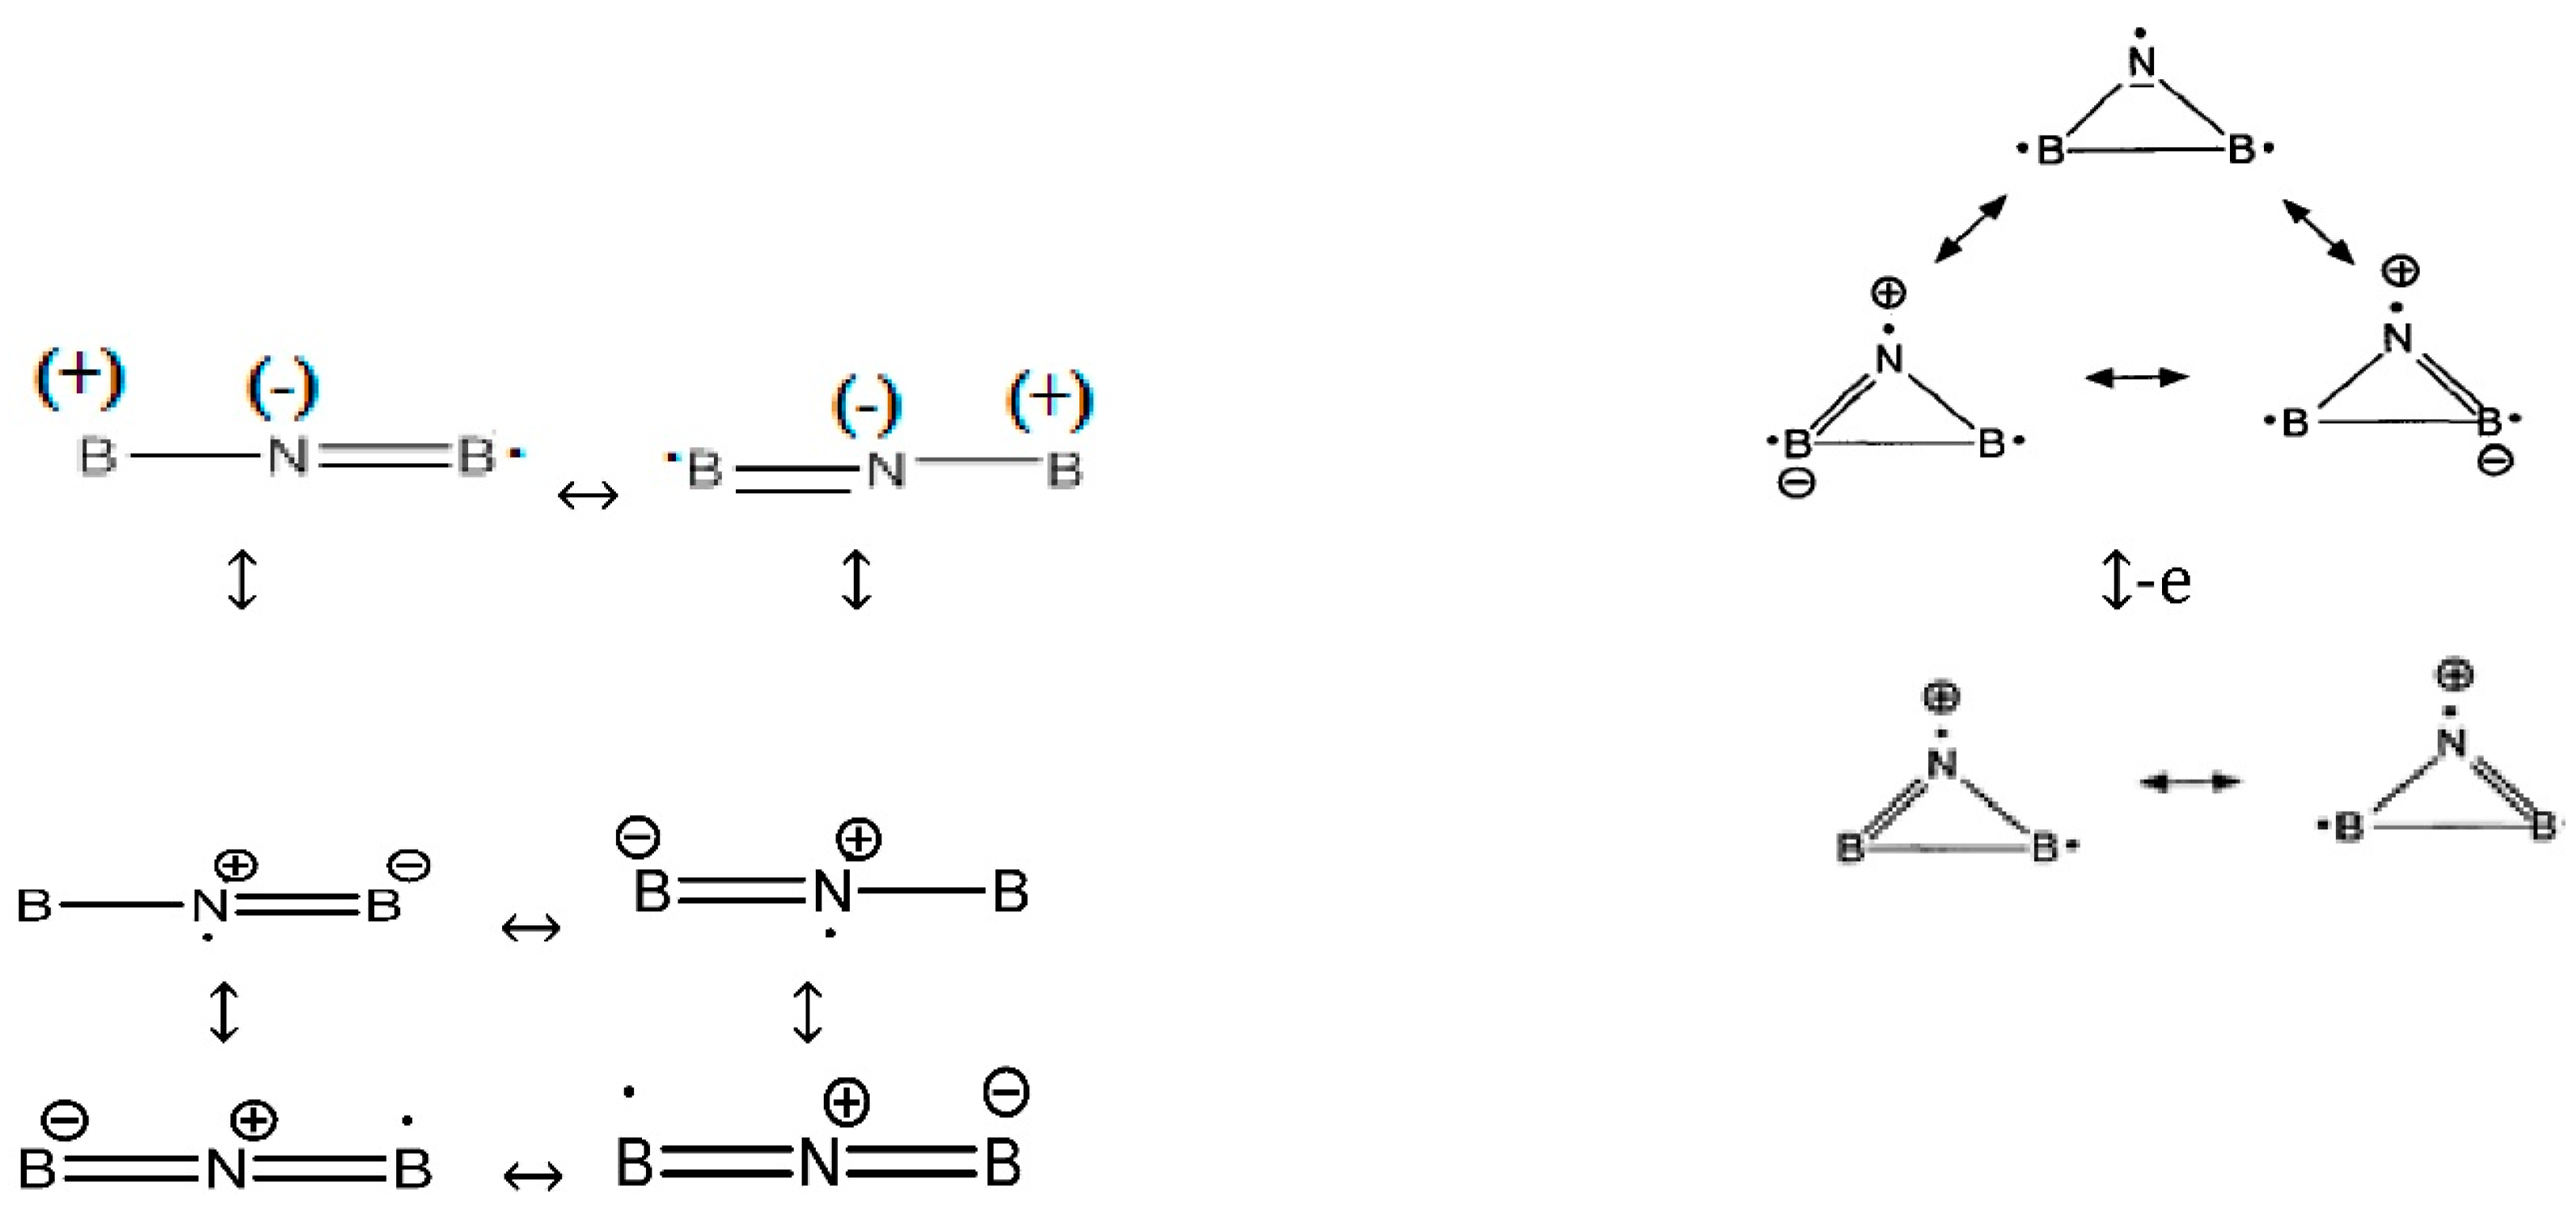 Molecules | Free Full-Text | Symmetry Breaking of B2N(−, 0